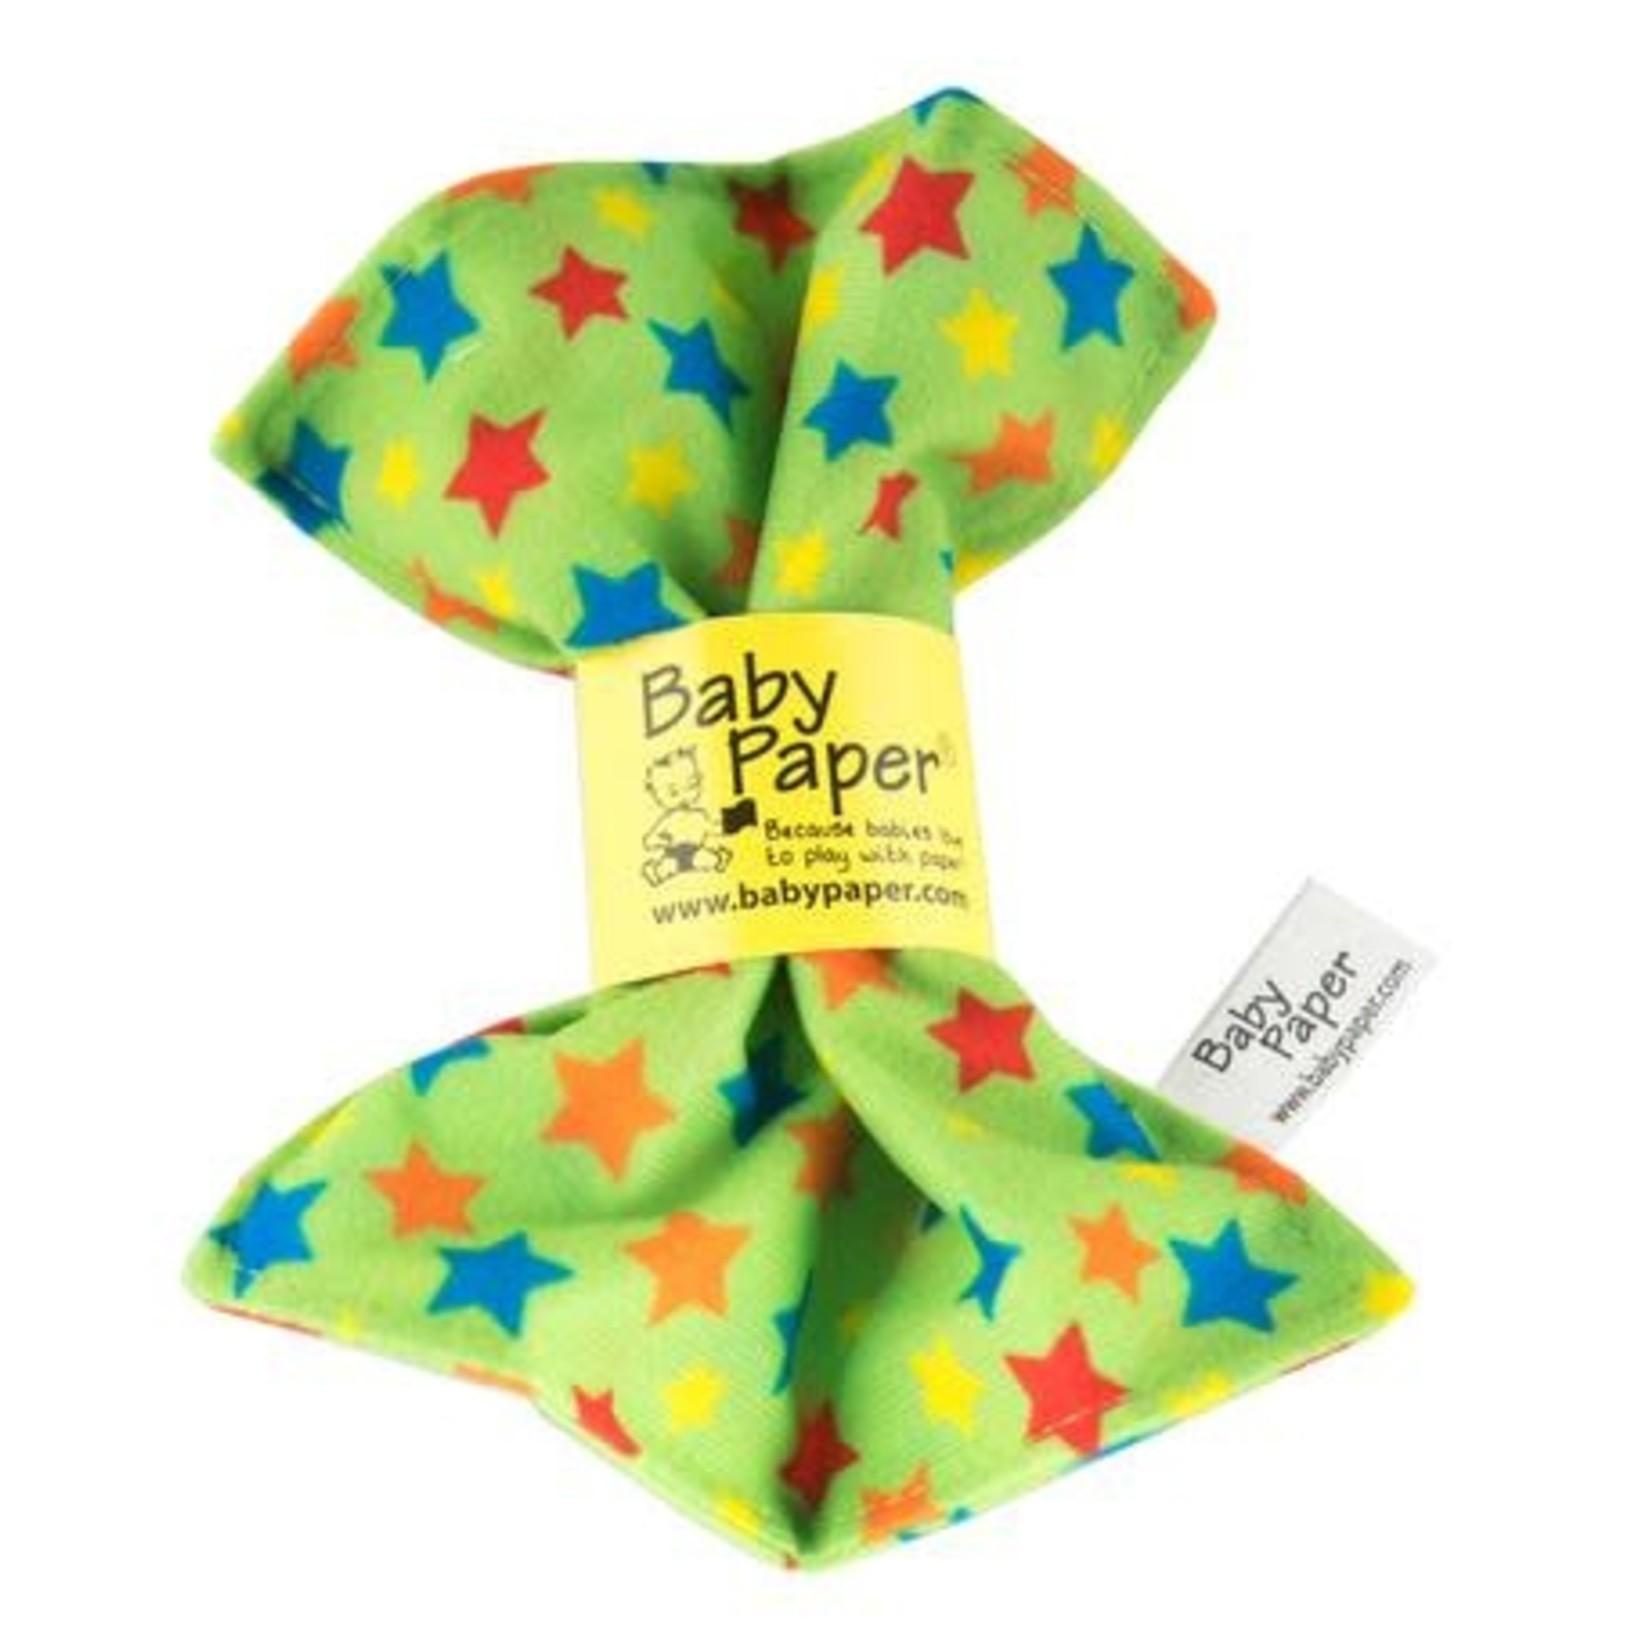 Baby Paper Baby Paper - Green Stars